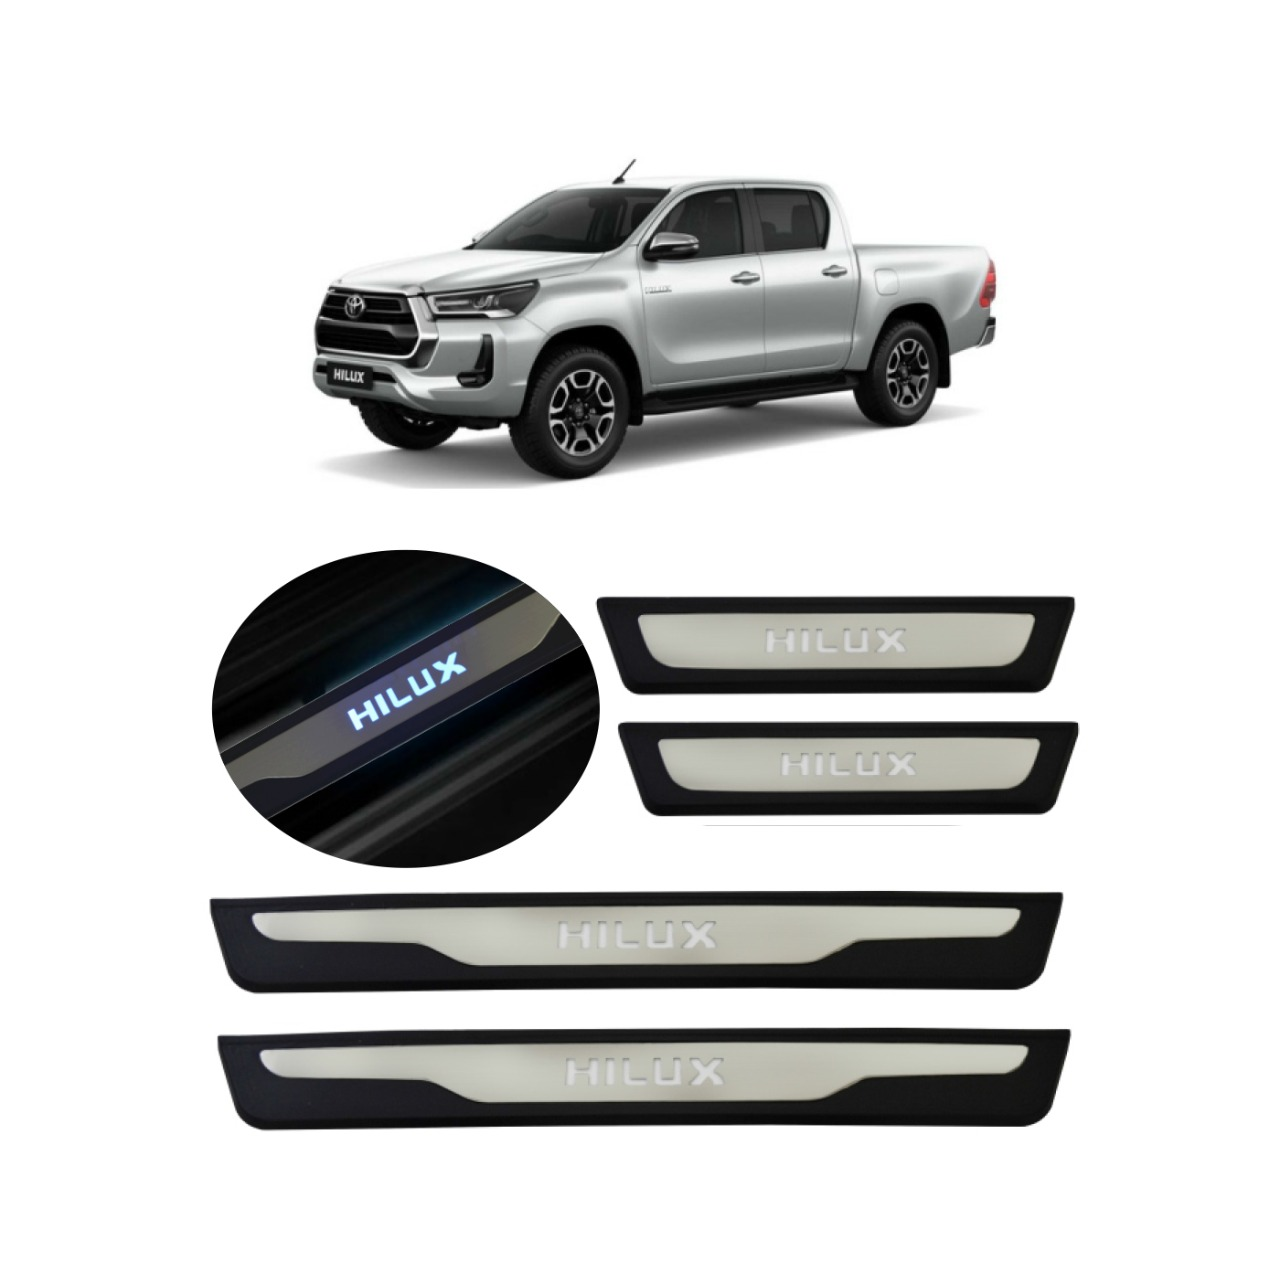 Kit Soleira de Porta C/ LED Toyota Hilux Cabine Dupla Inox Iluminada